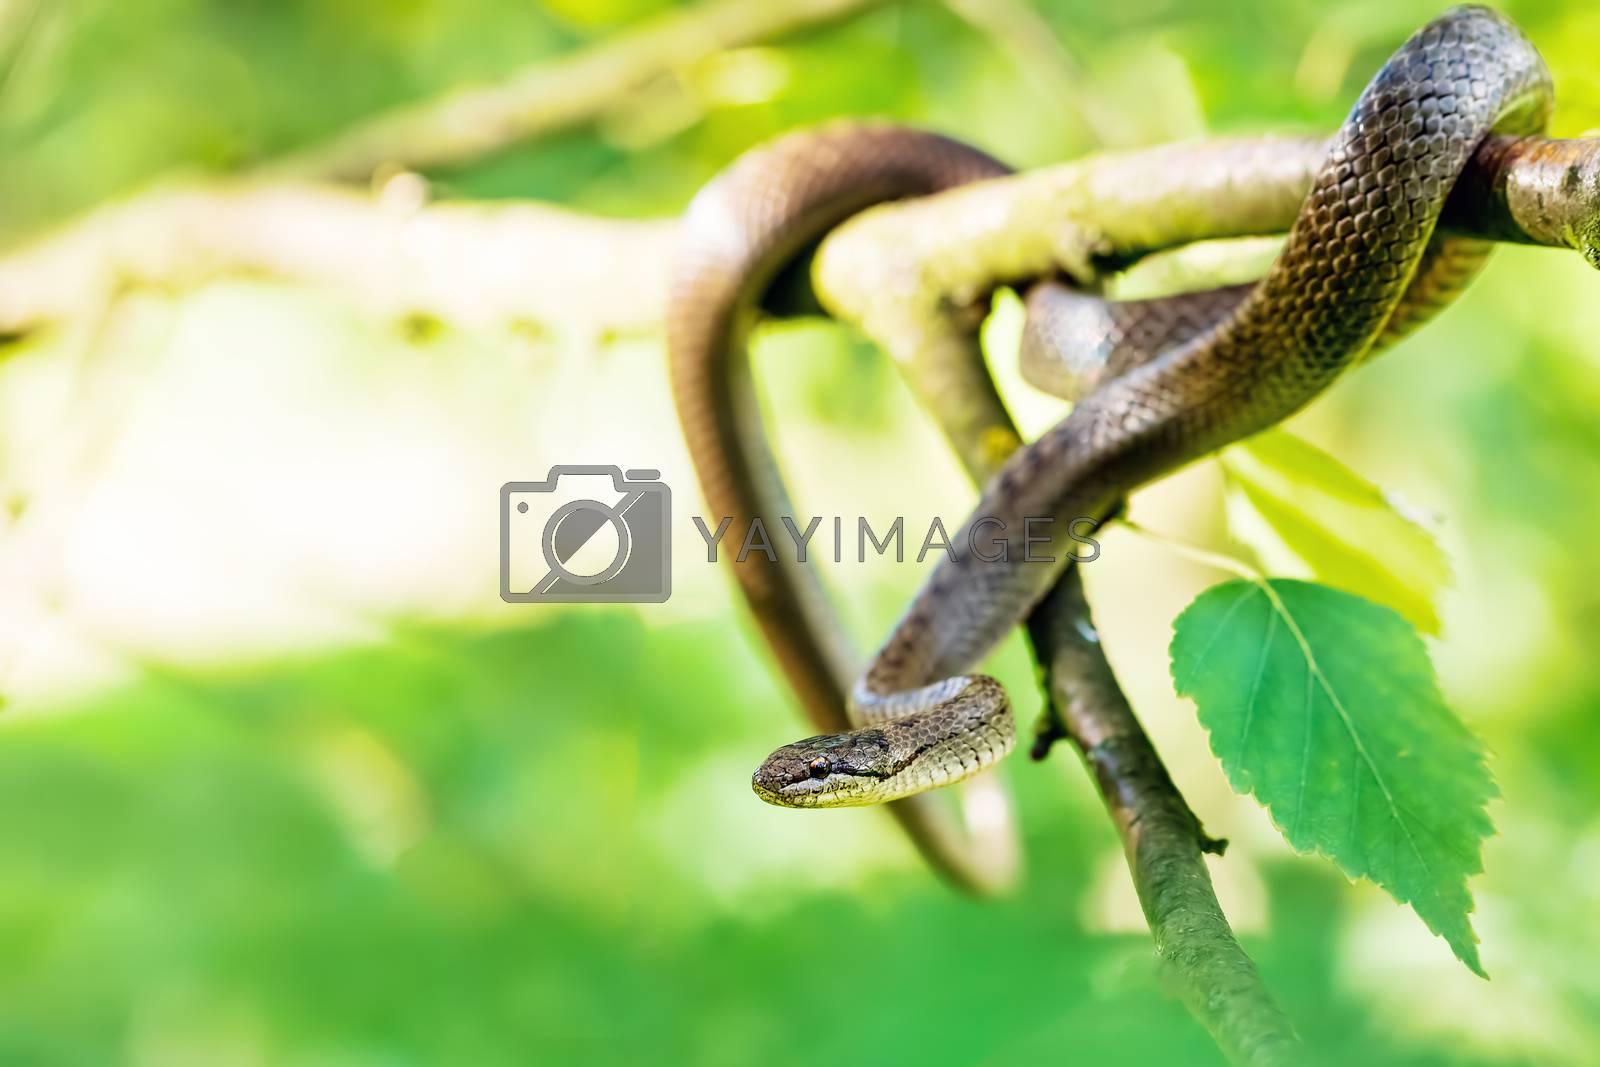 Non venomous Smooth snake, Coronella austriaca hanged on tree, Czech Republic, Europe wildlife